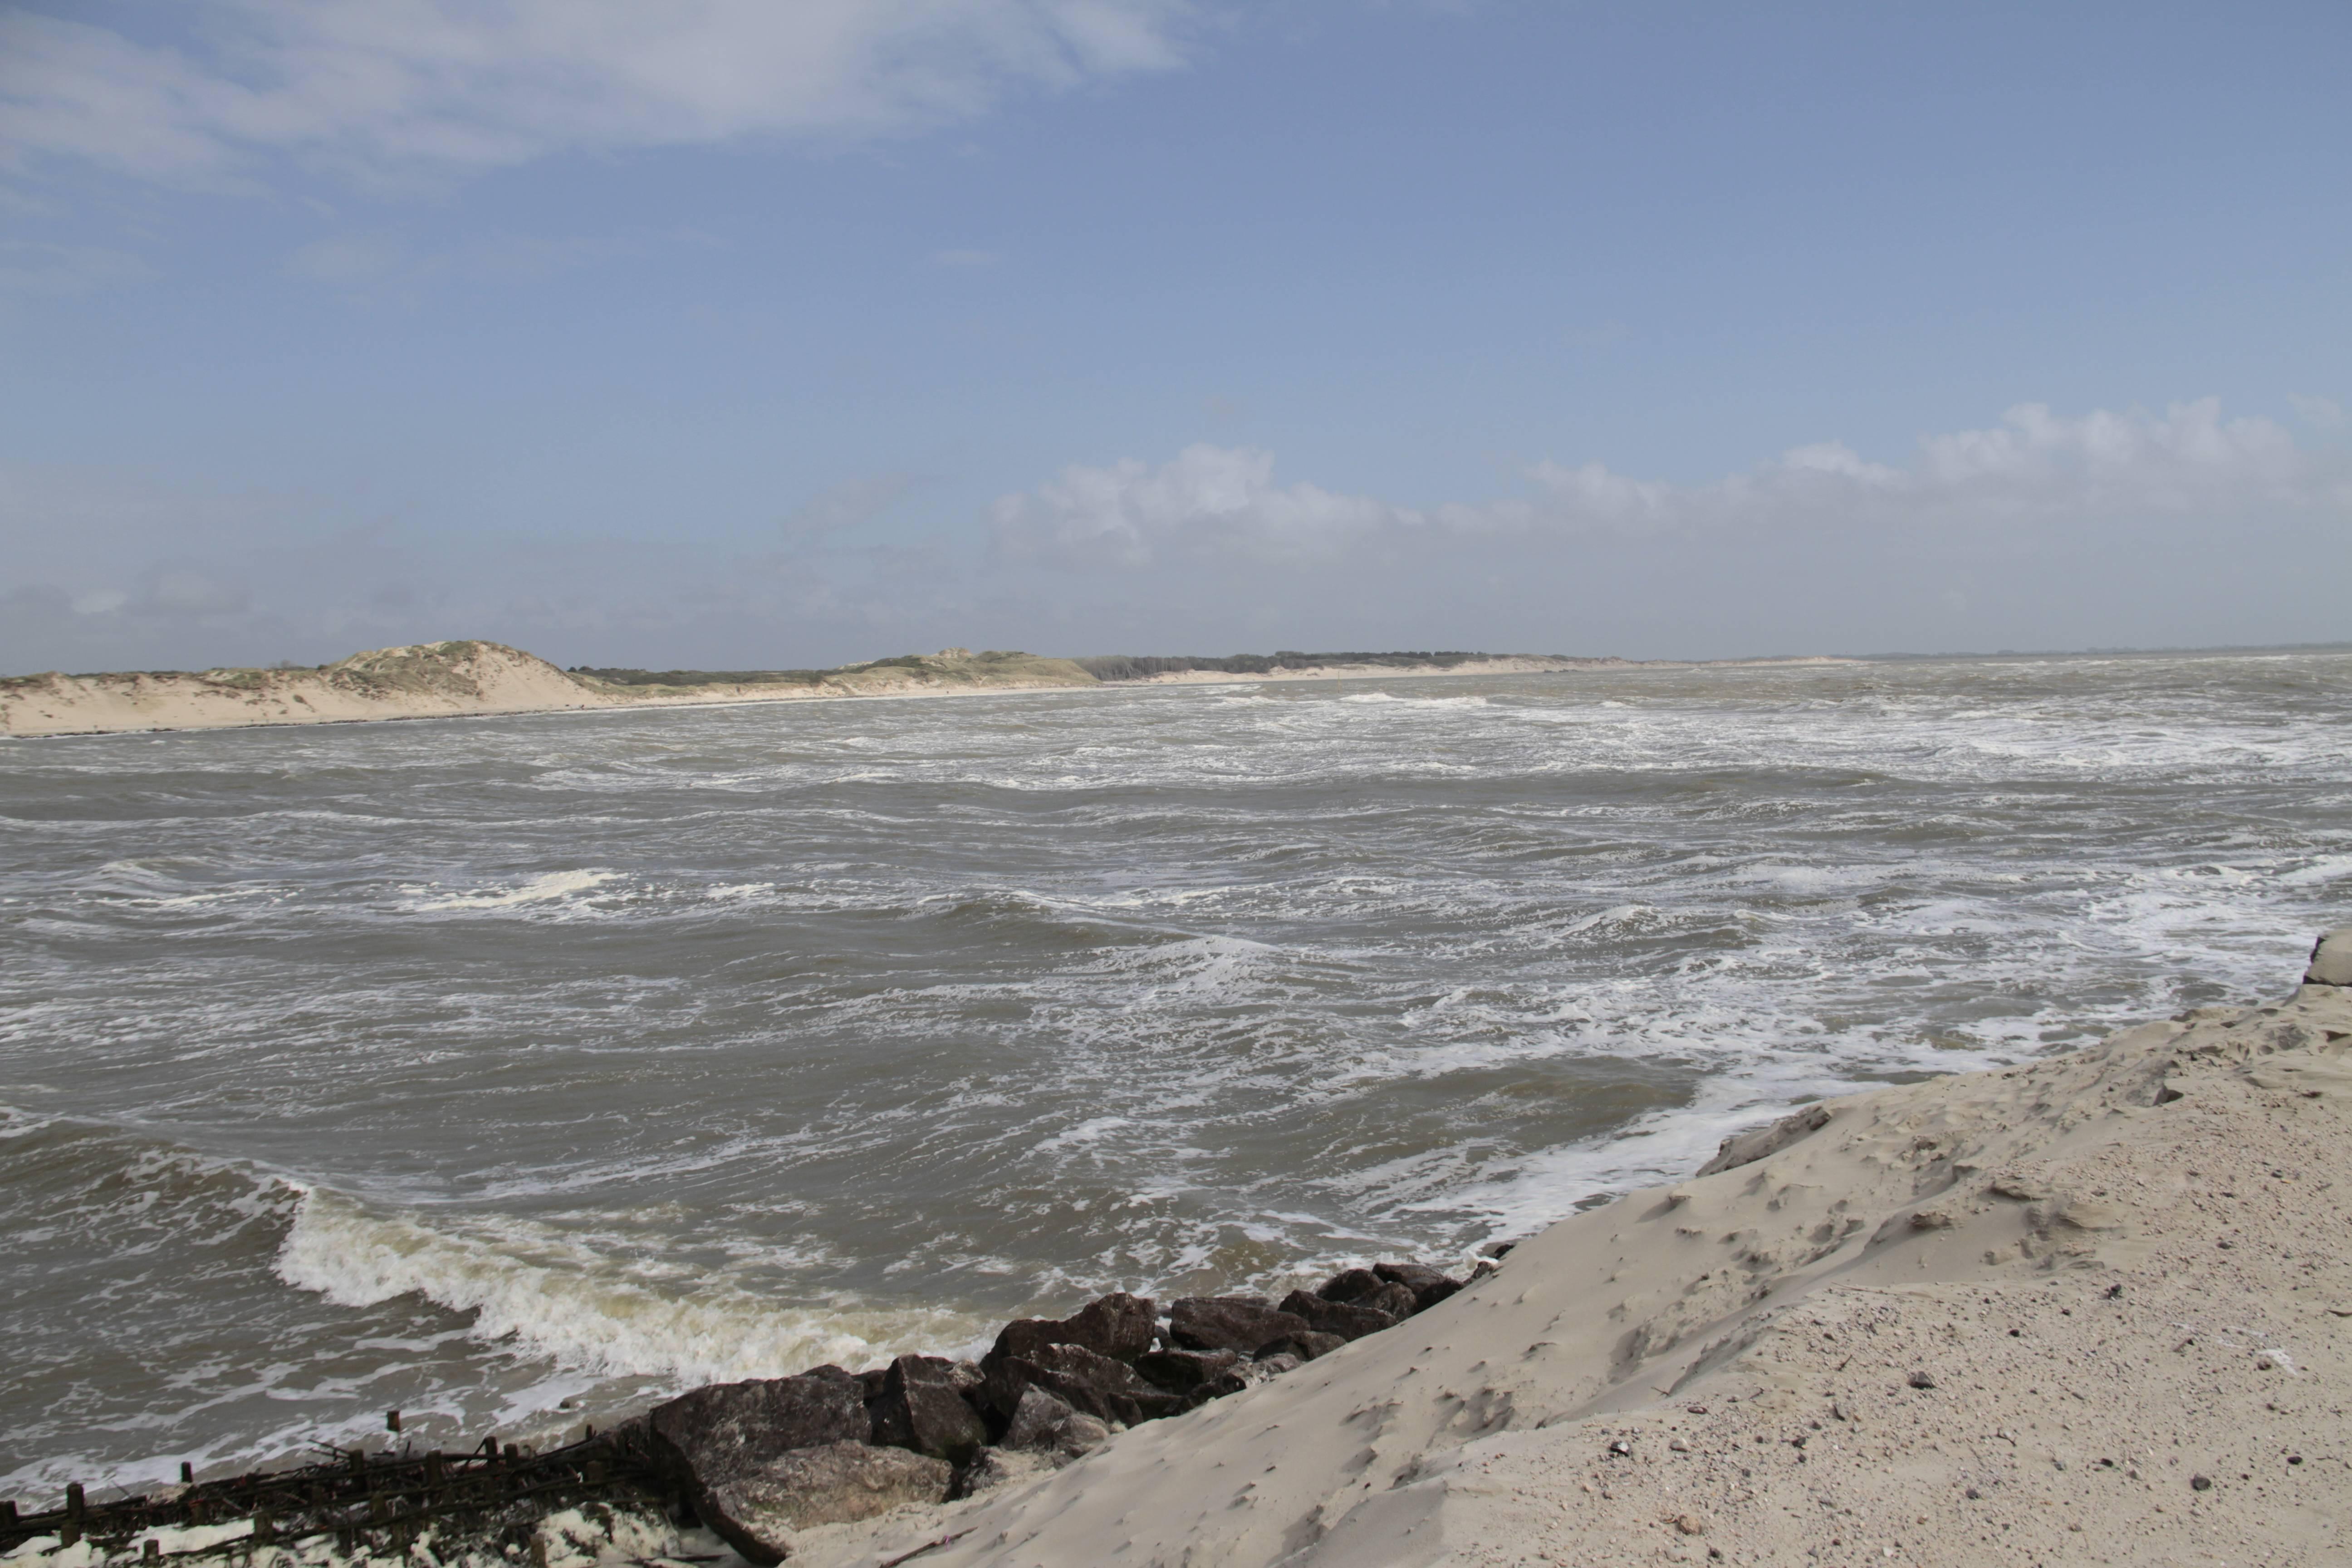 Baie de Somme mai 2015_0113 Berck sur mer